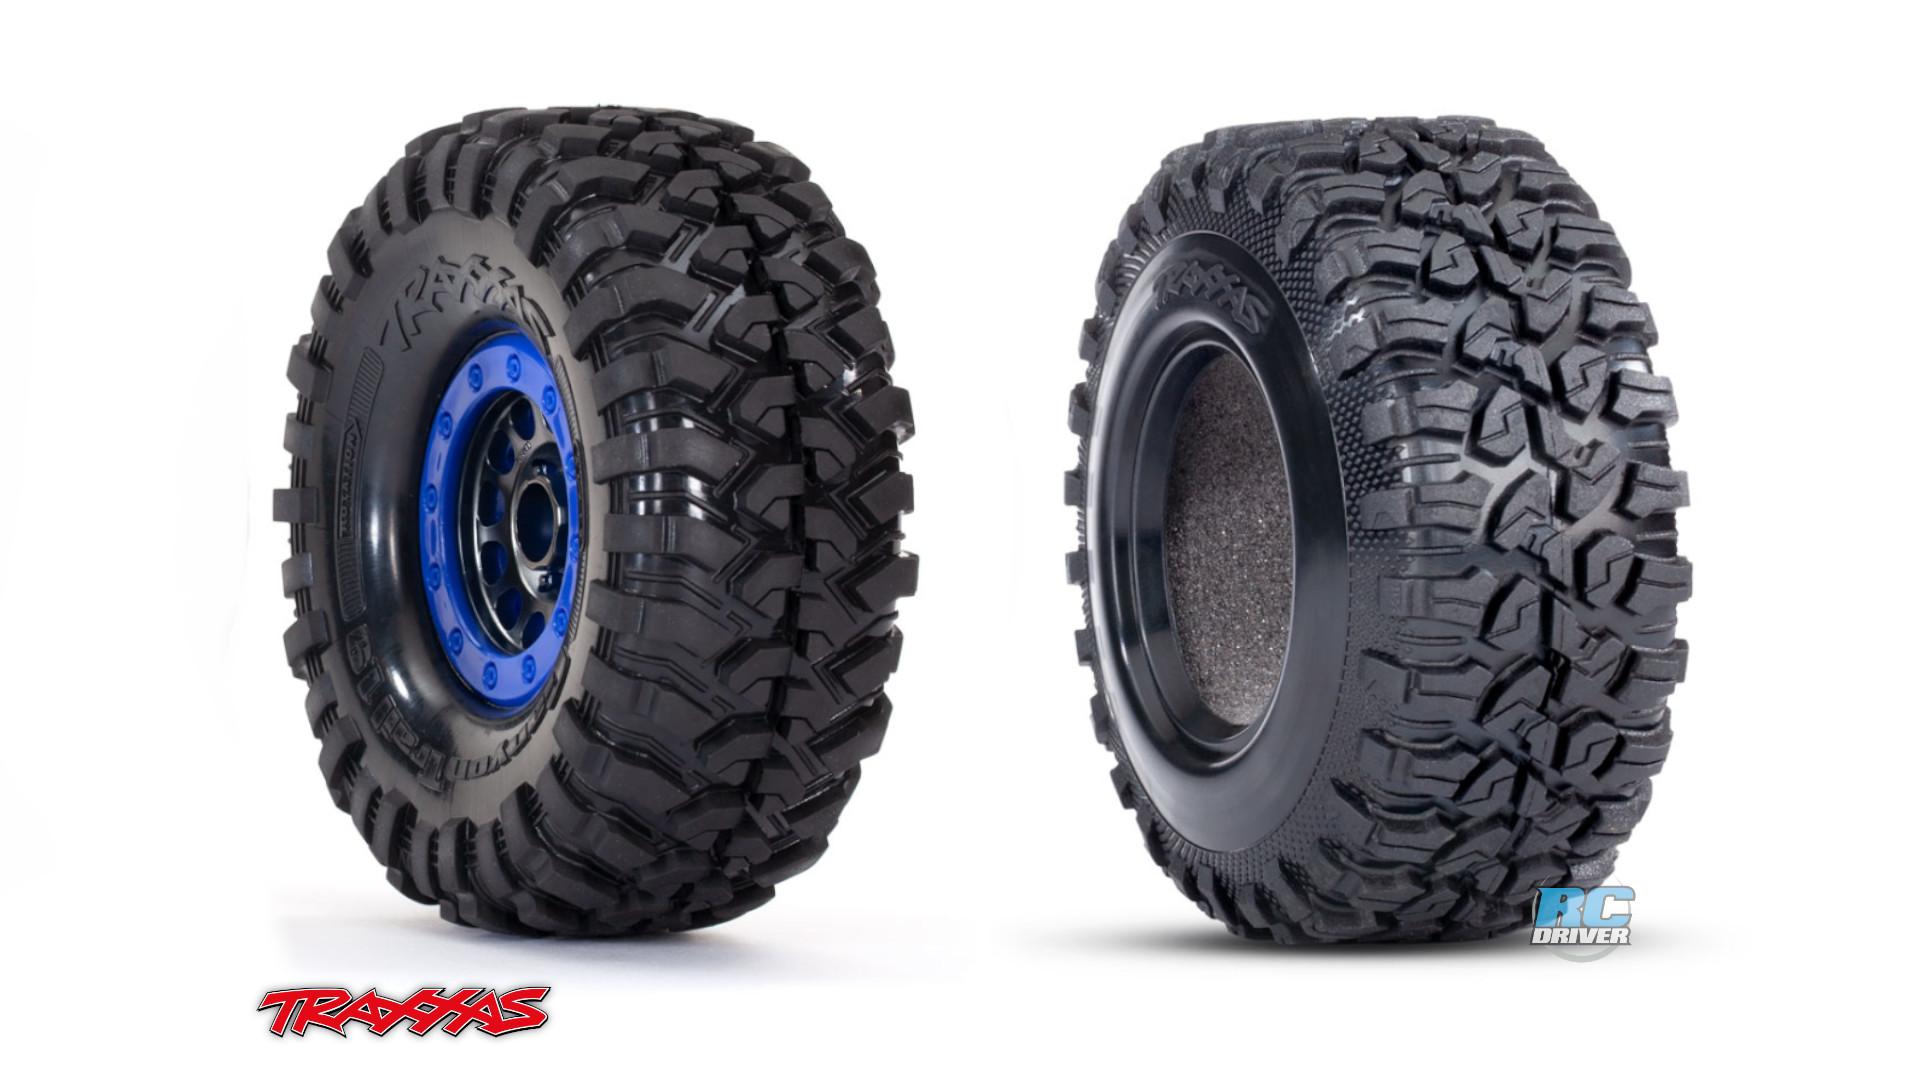 Traxxas Method Mounted Wheels & Canyon Tires For TRX-4